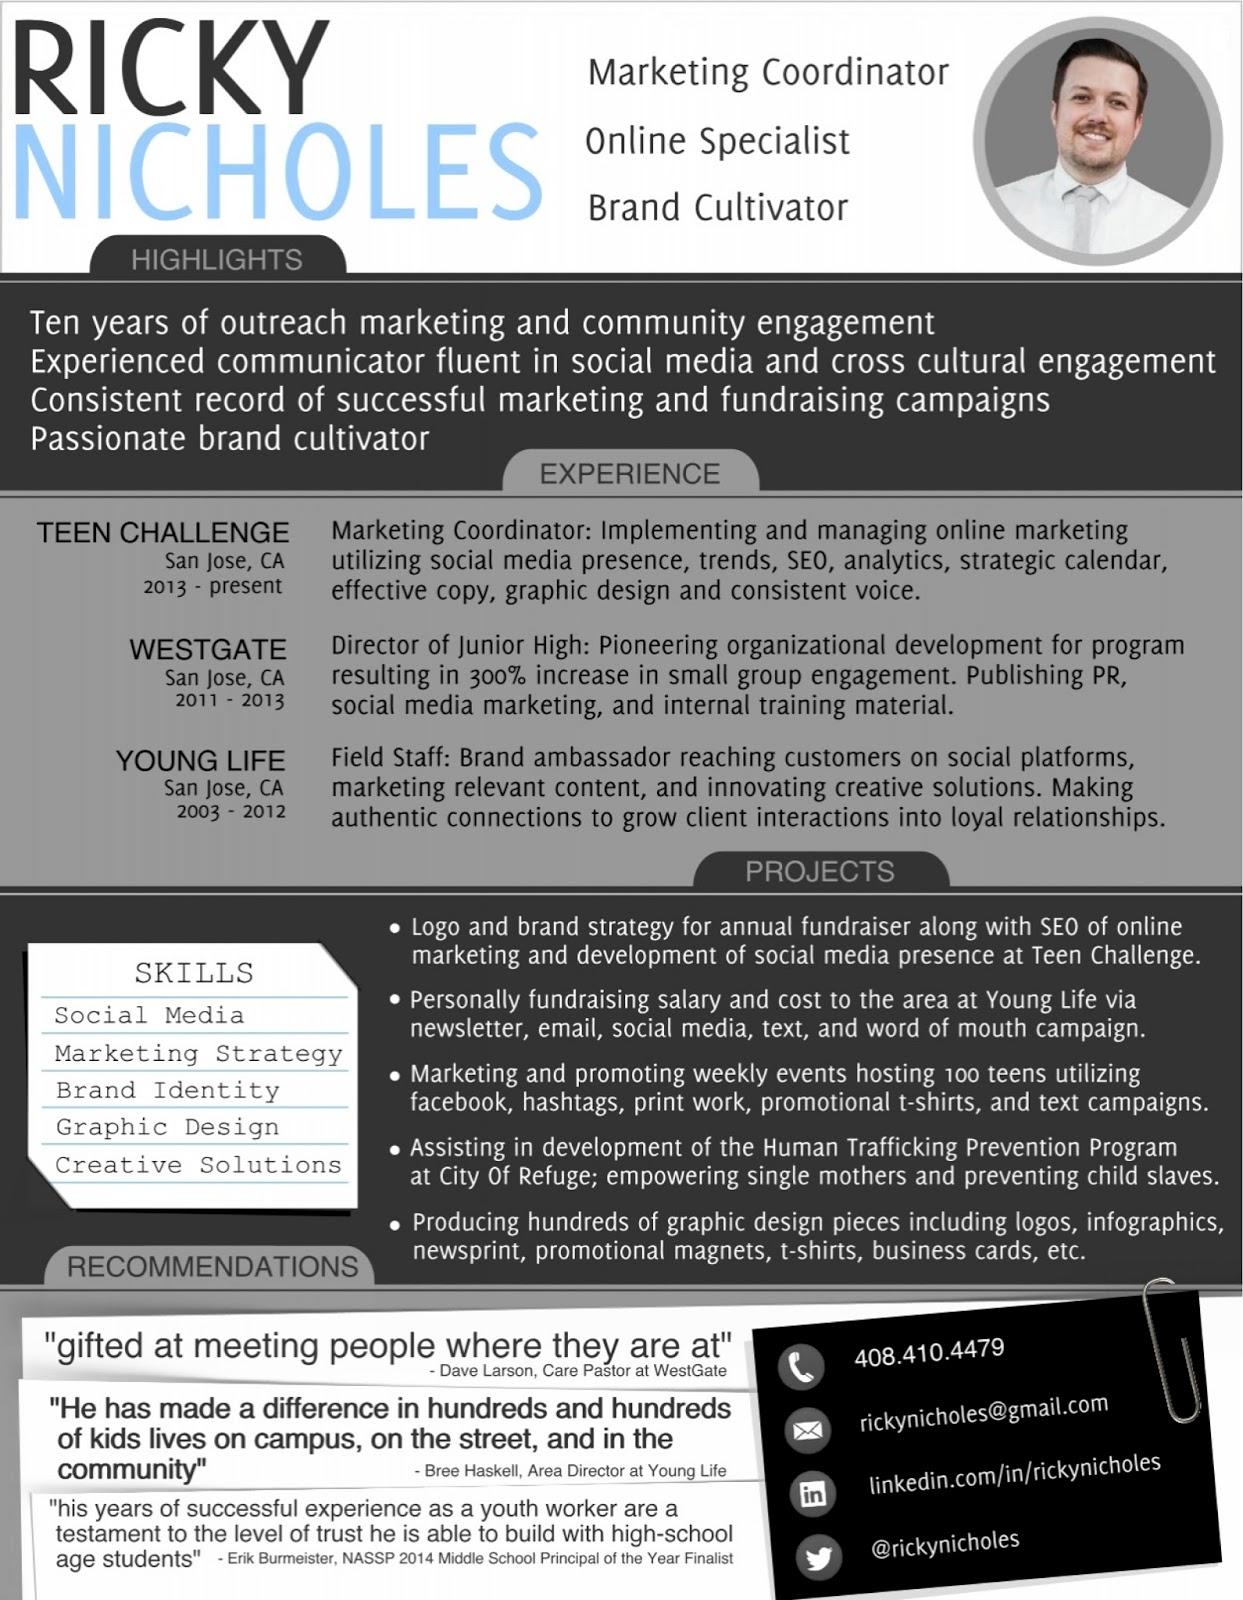 Sample Resume For Event Coordinator: Marketing Coordinator ...